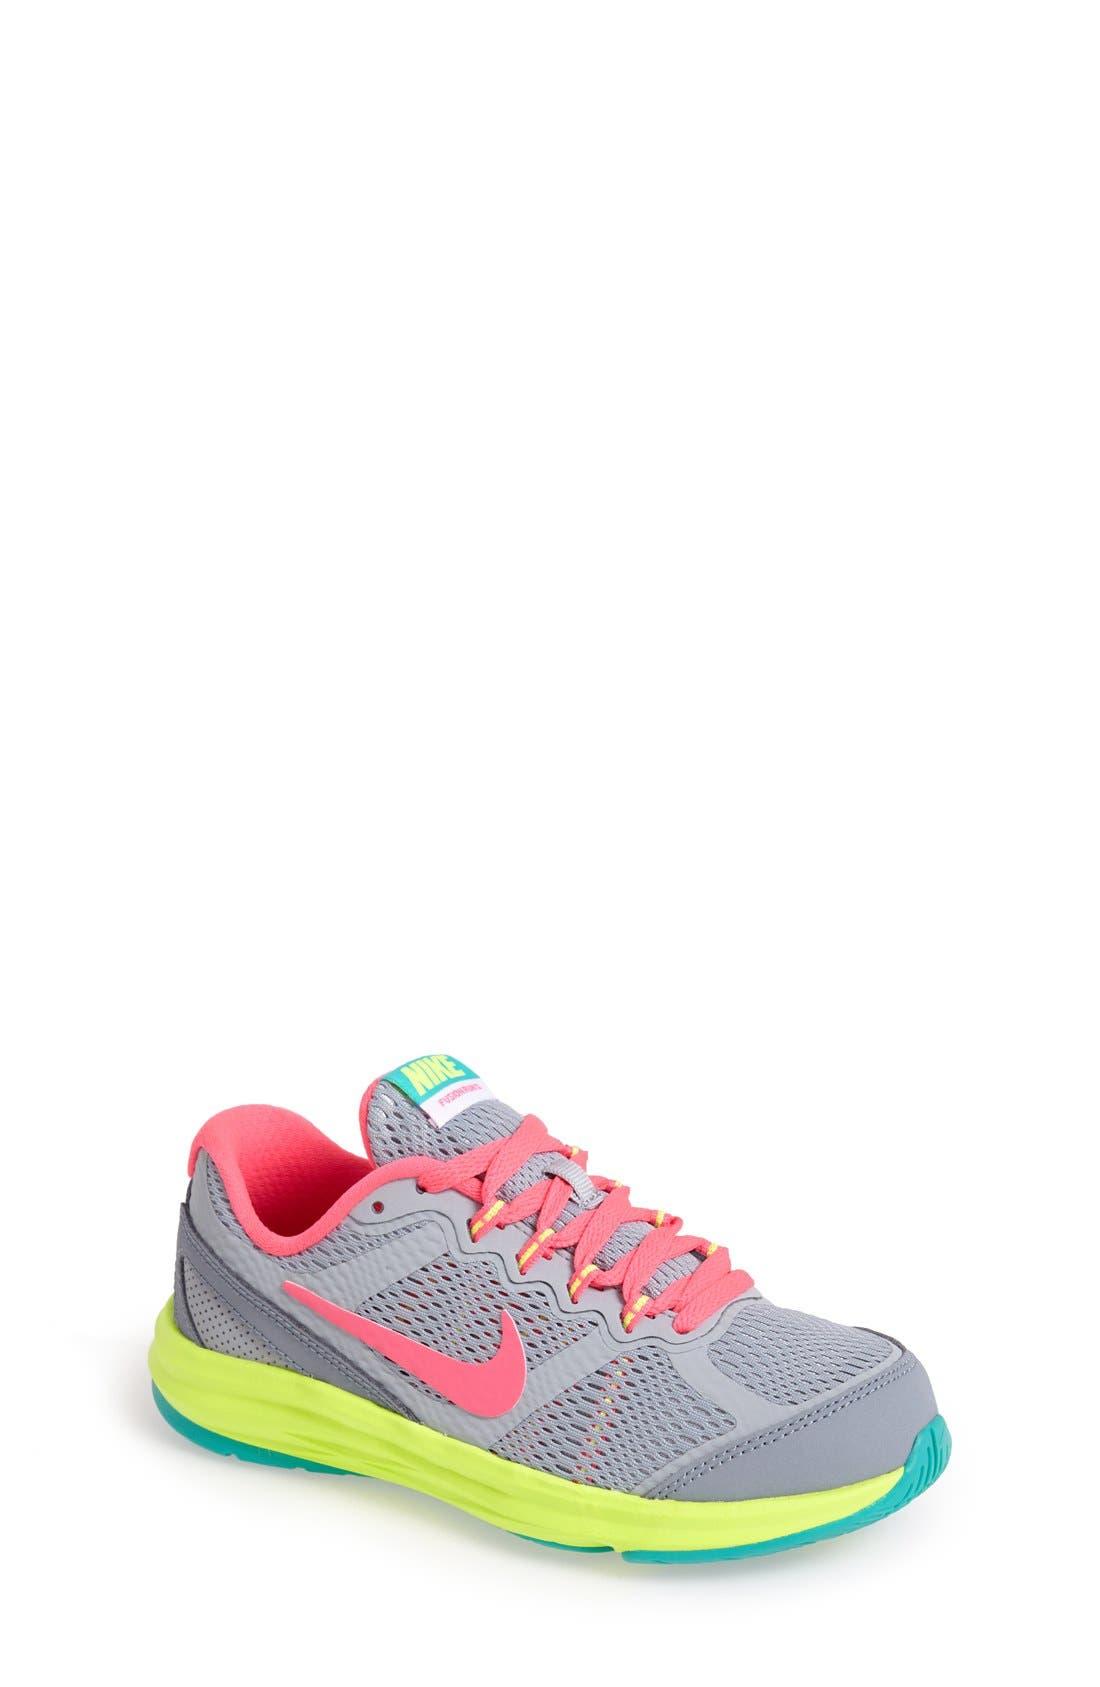 Main Image - Nike 'Dual Fusion Run' Athletic Shoe (Toddler & Little Kid)